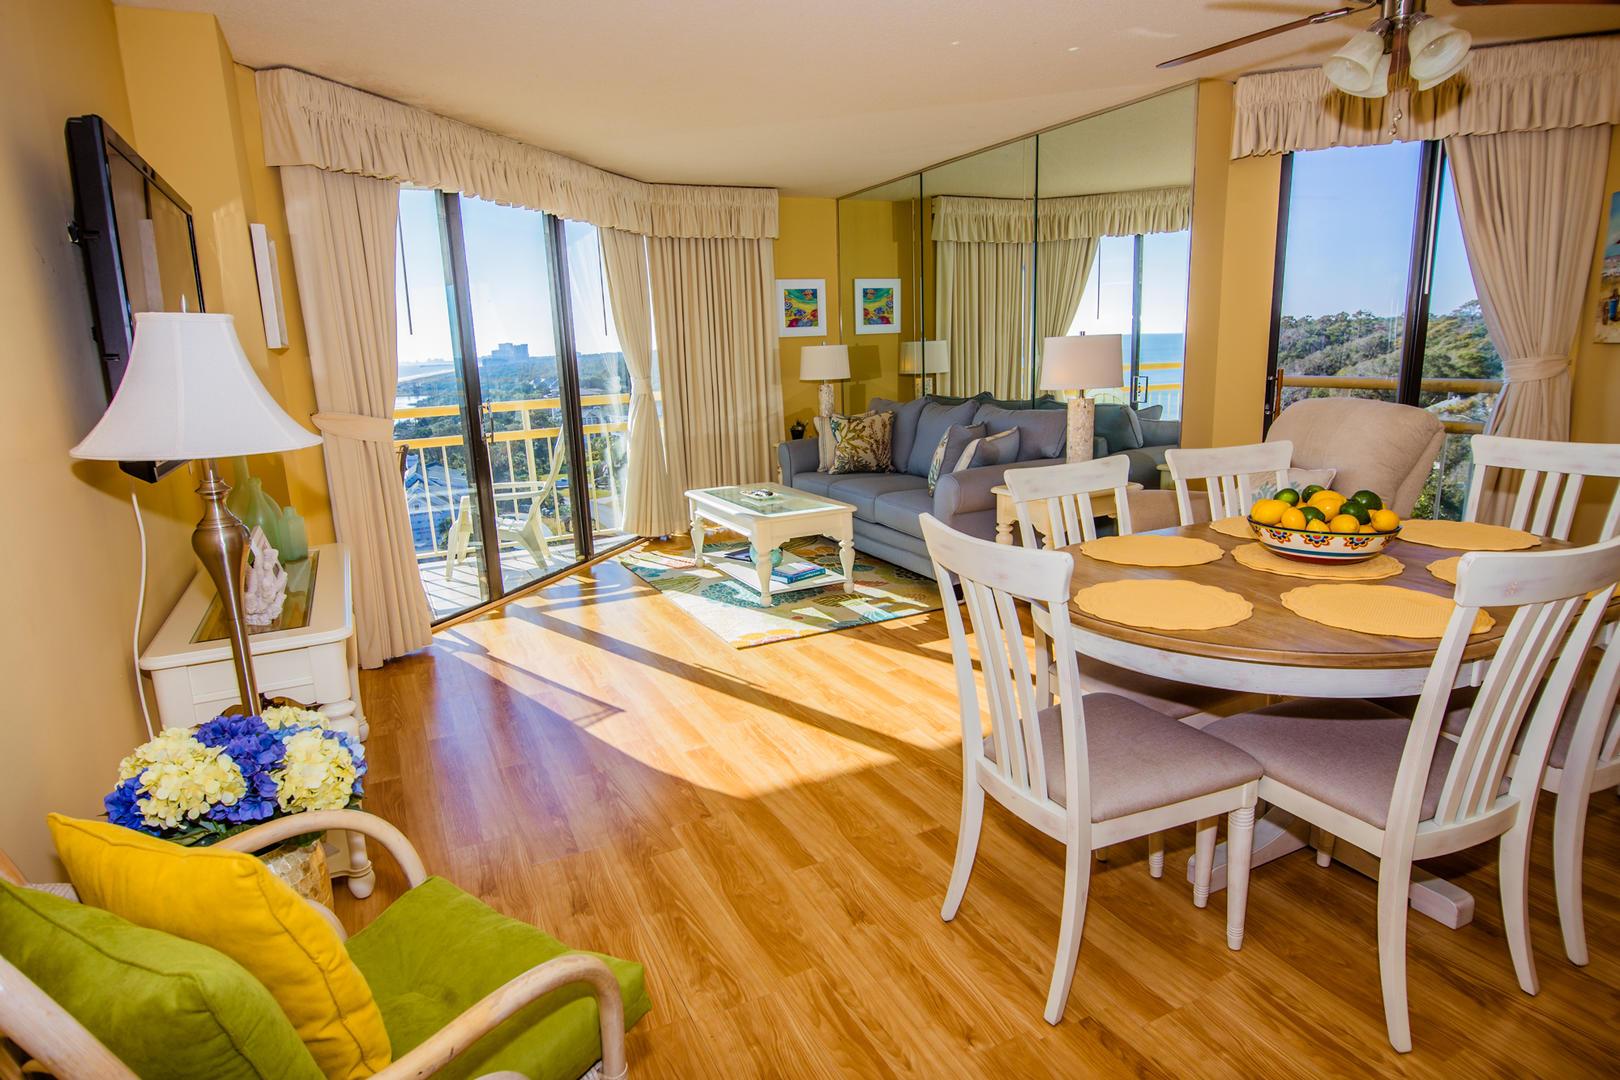 Ocean Creek NN9 - Living Room and Dining Area